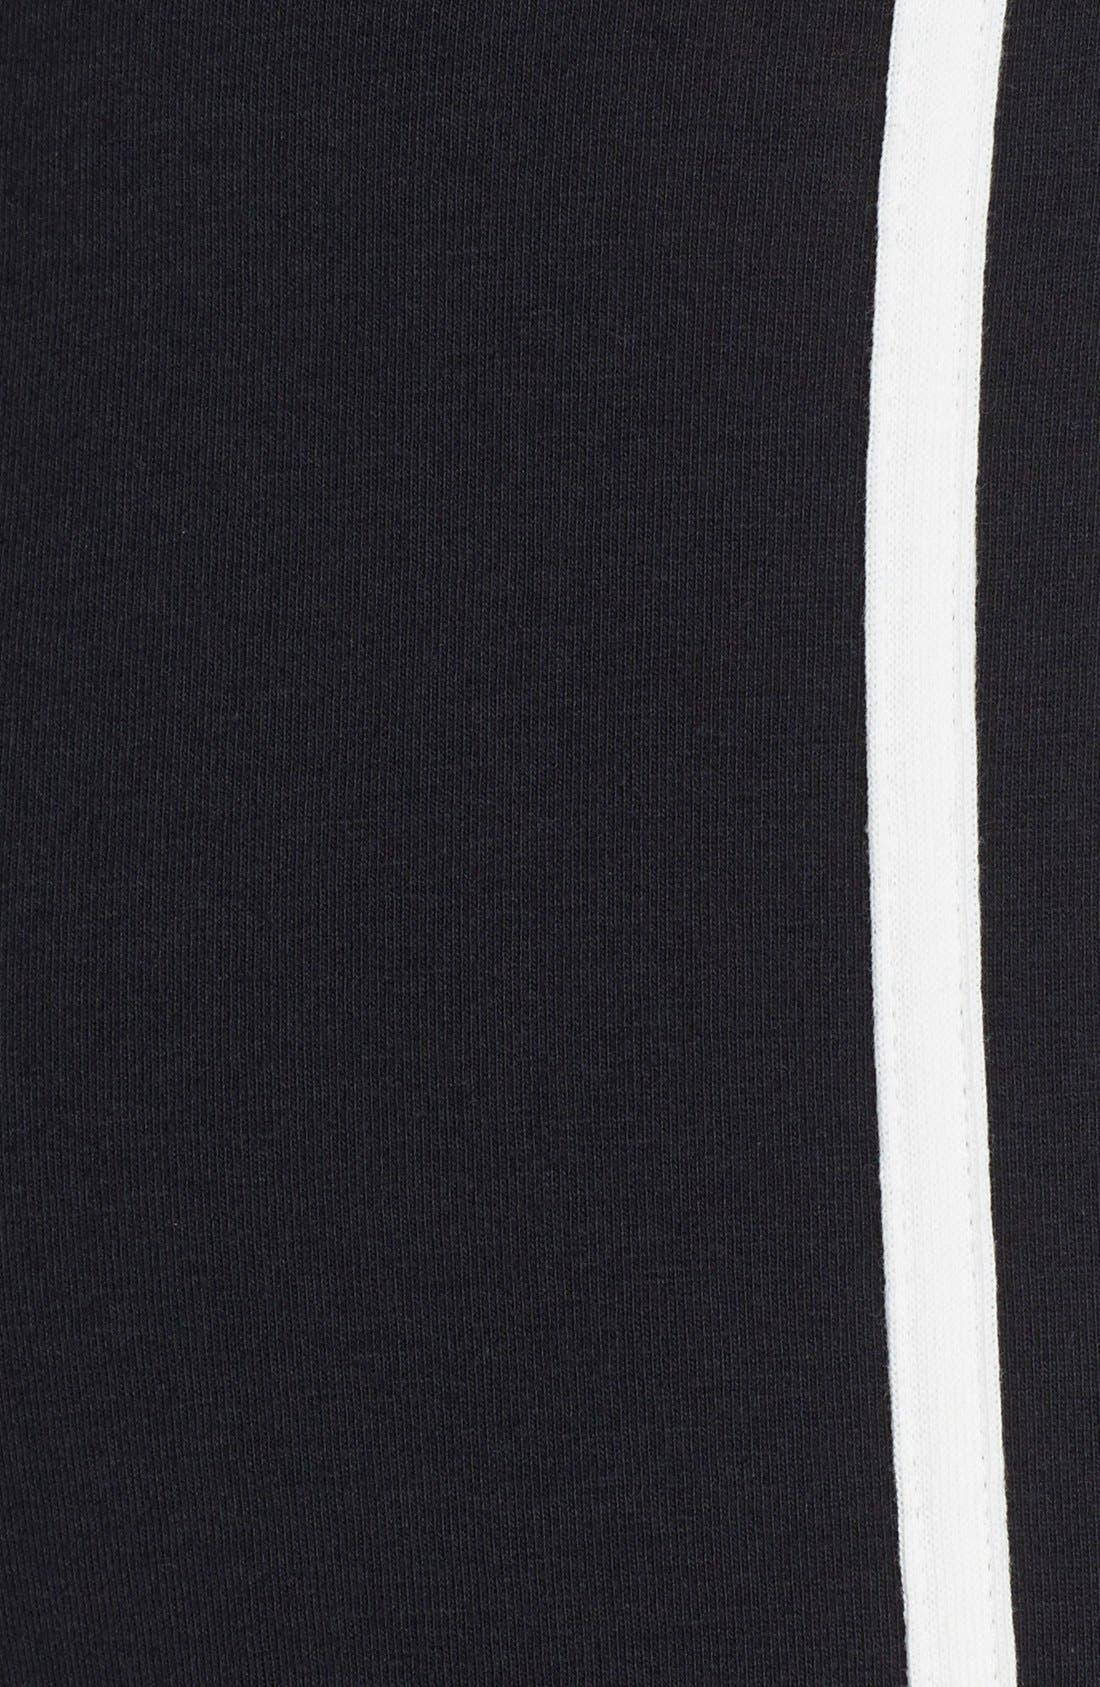 Alternate Image 3  - adidas Originals Trefoil Leggings (Online Only)